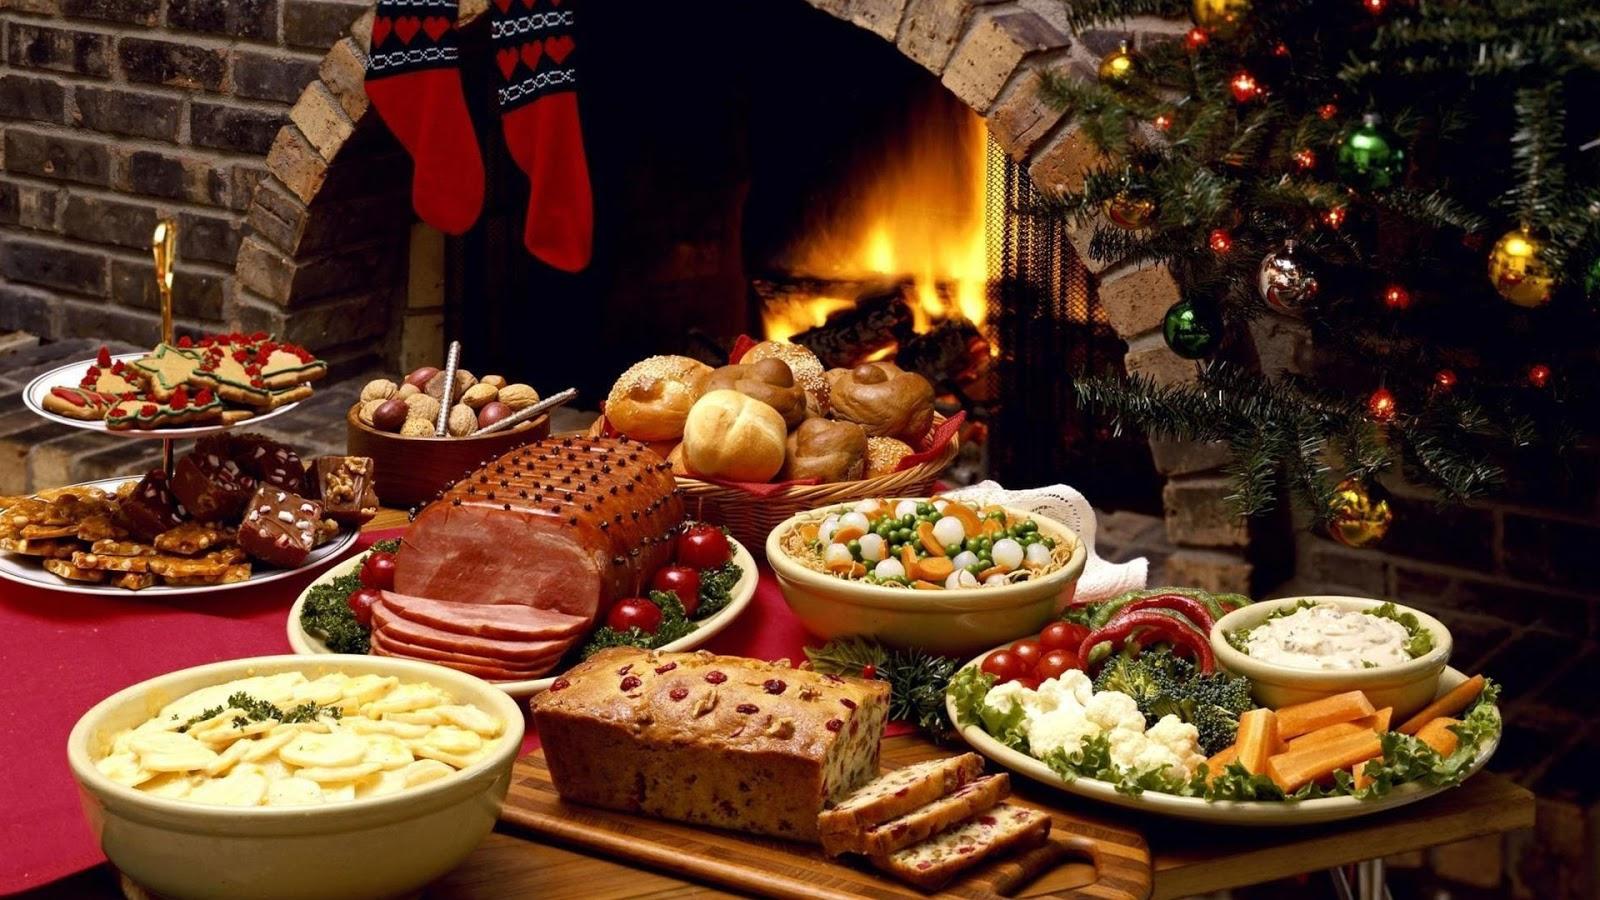 Resultado de imagen para diciembre modelo comida